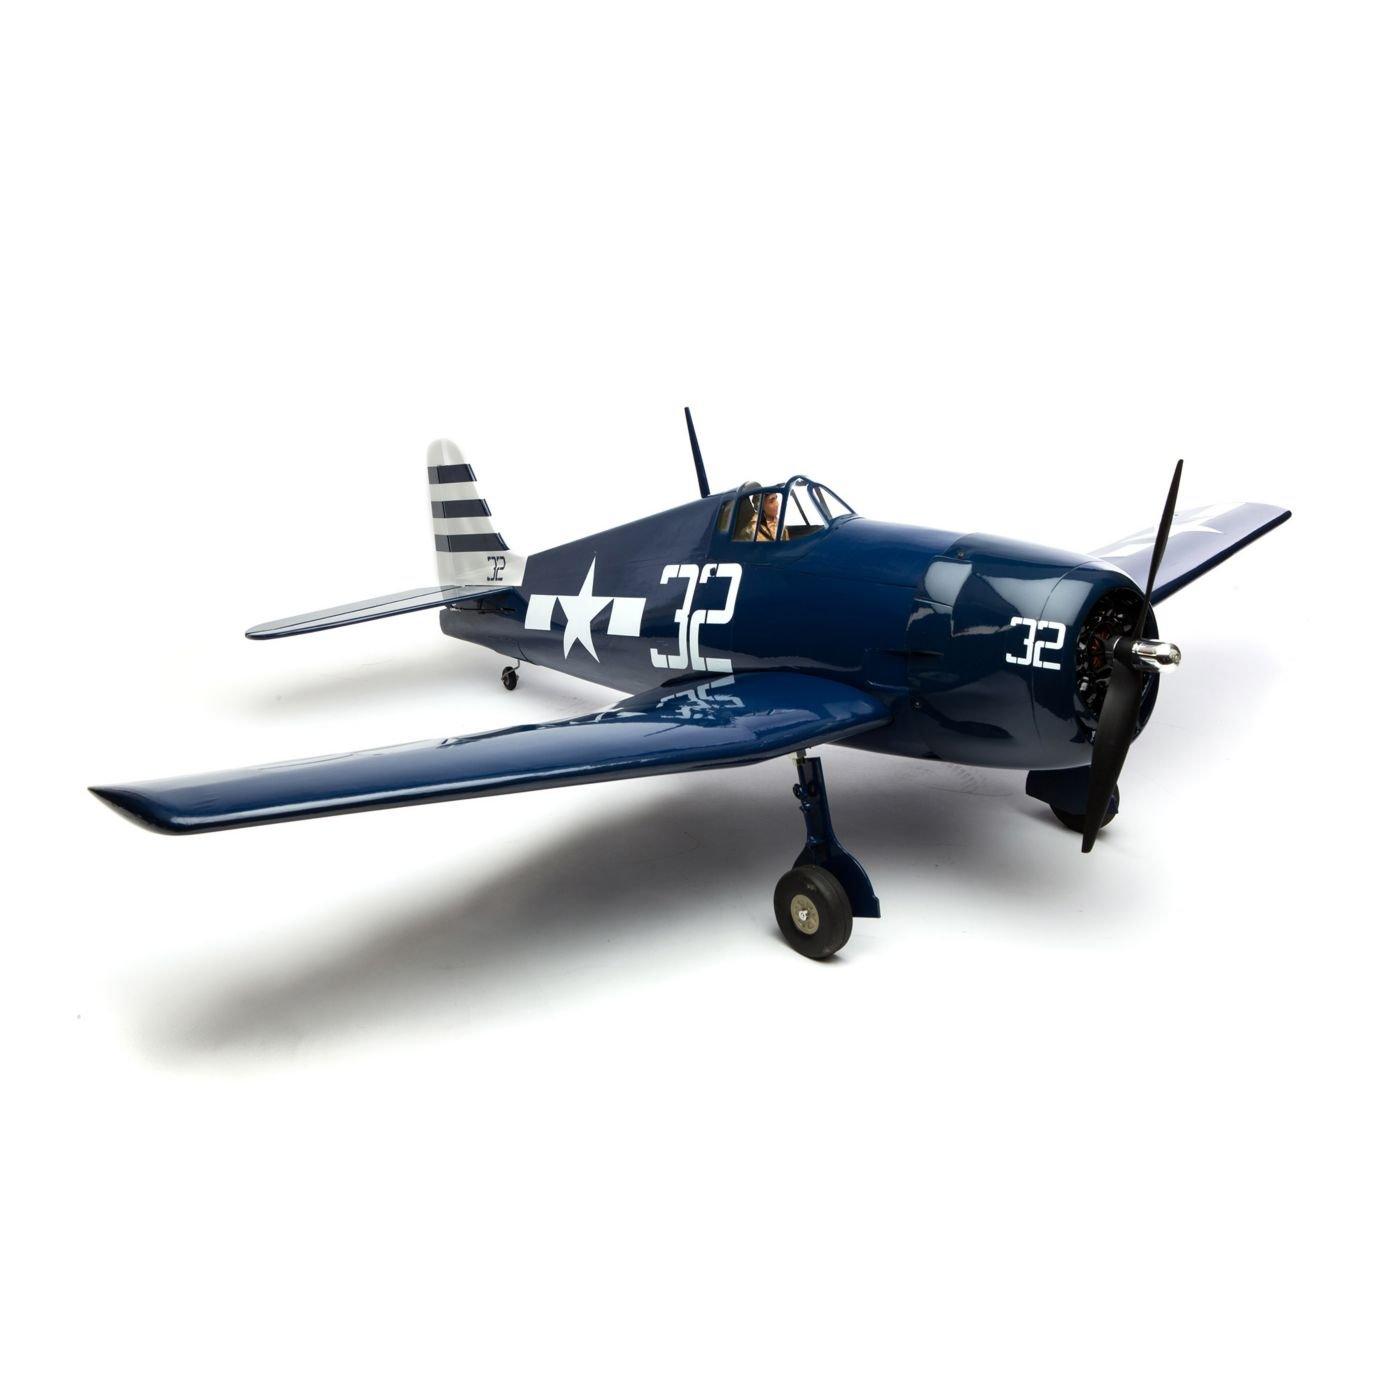 Amazon.com: Hangar 9 F6F Casco 15 cc ARF: Toys & Games